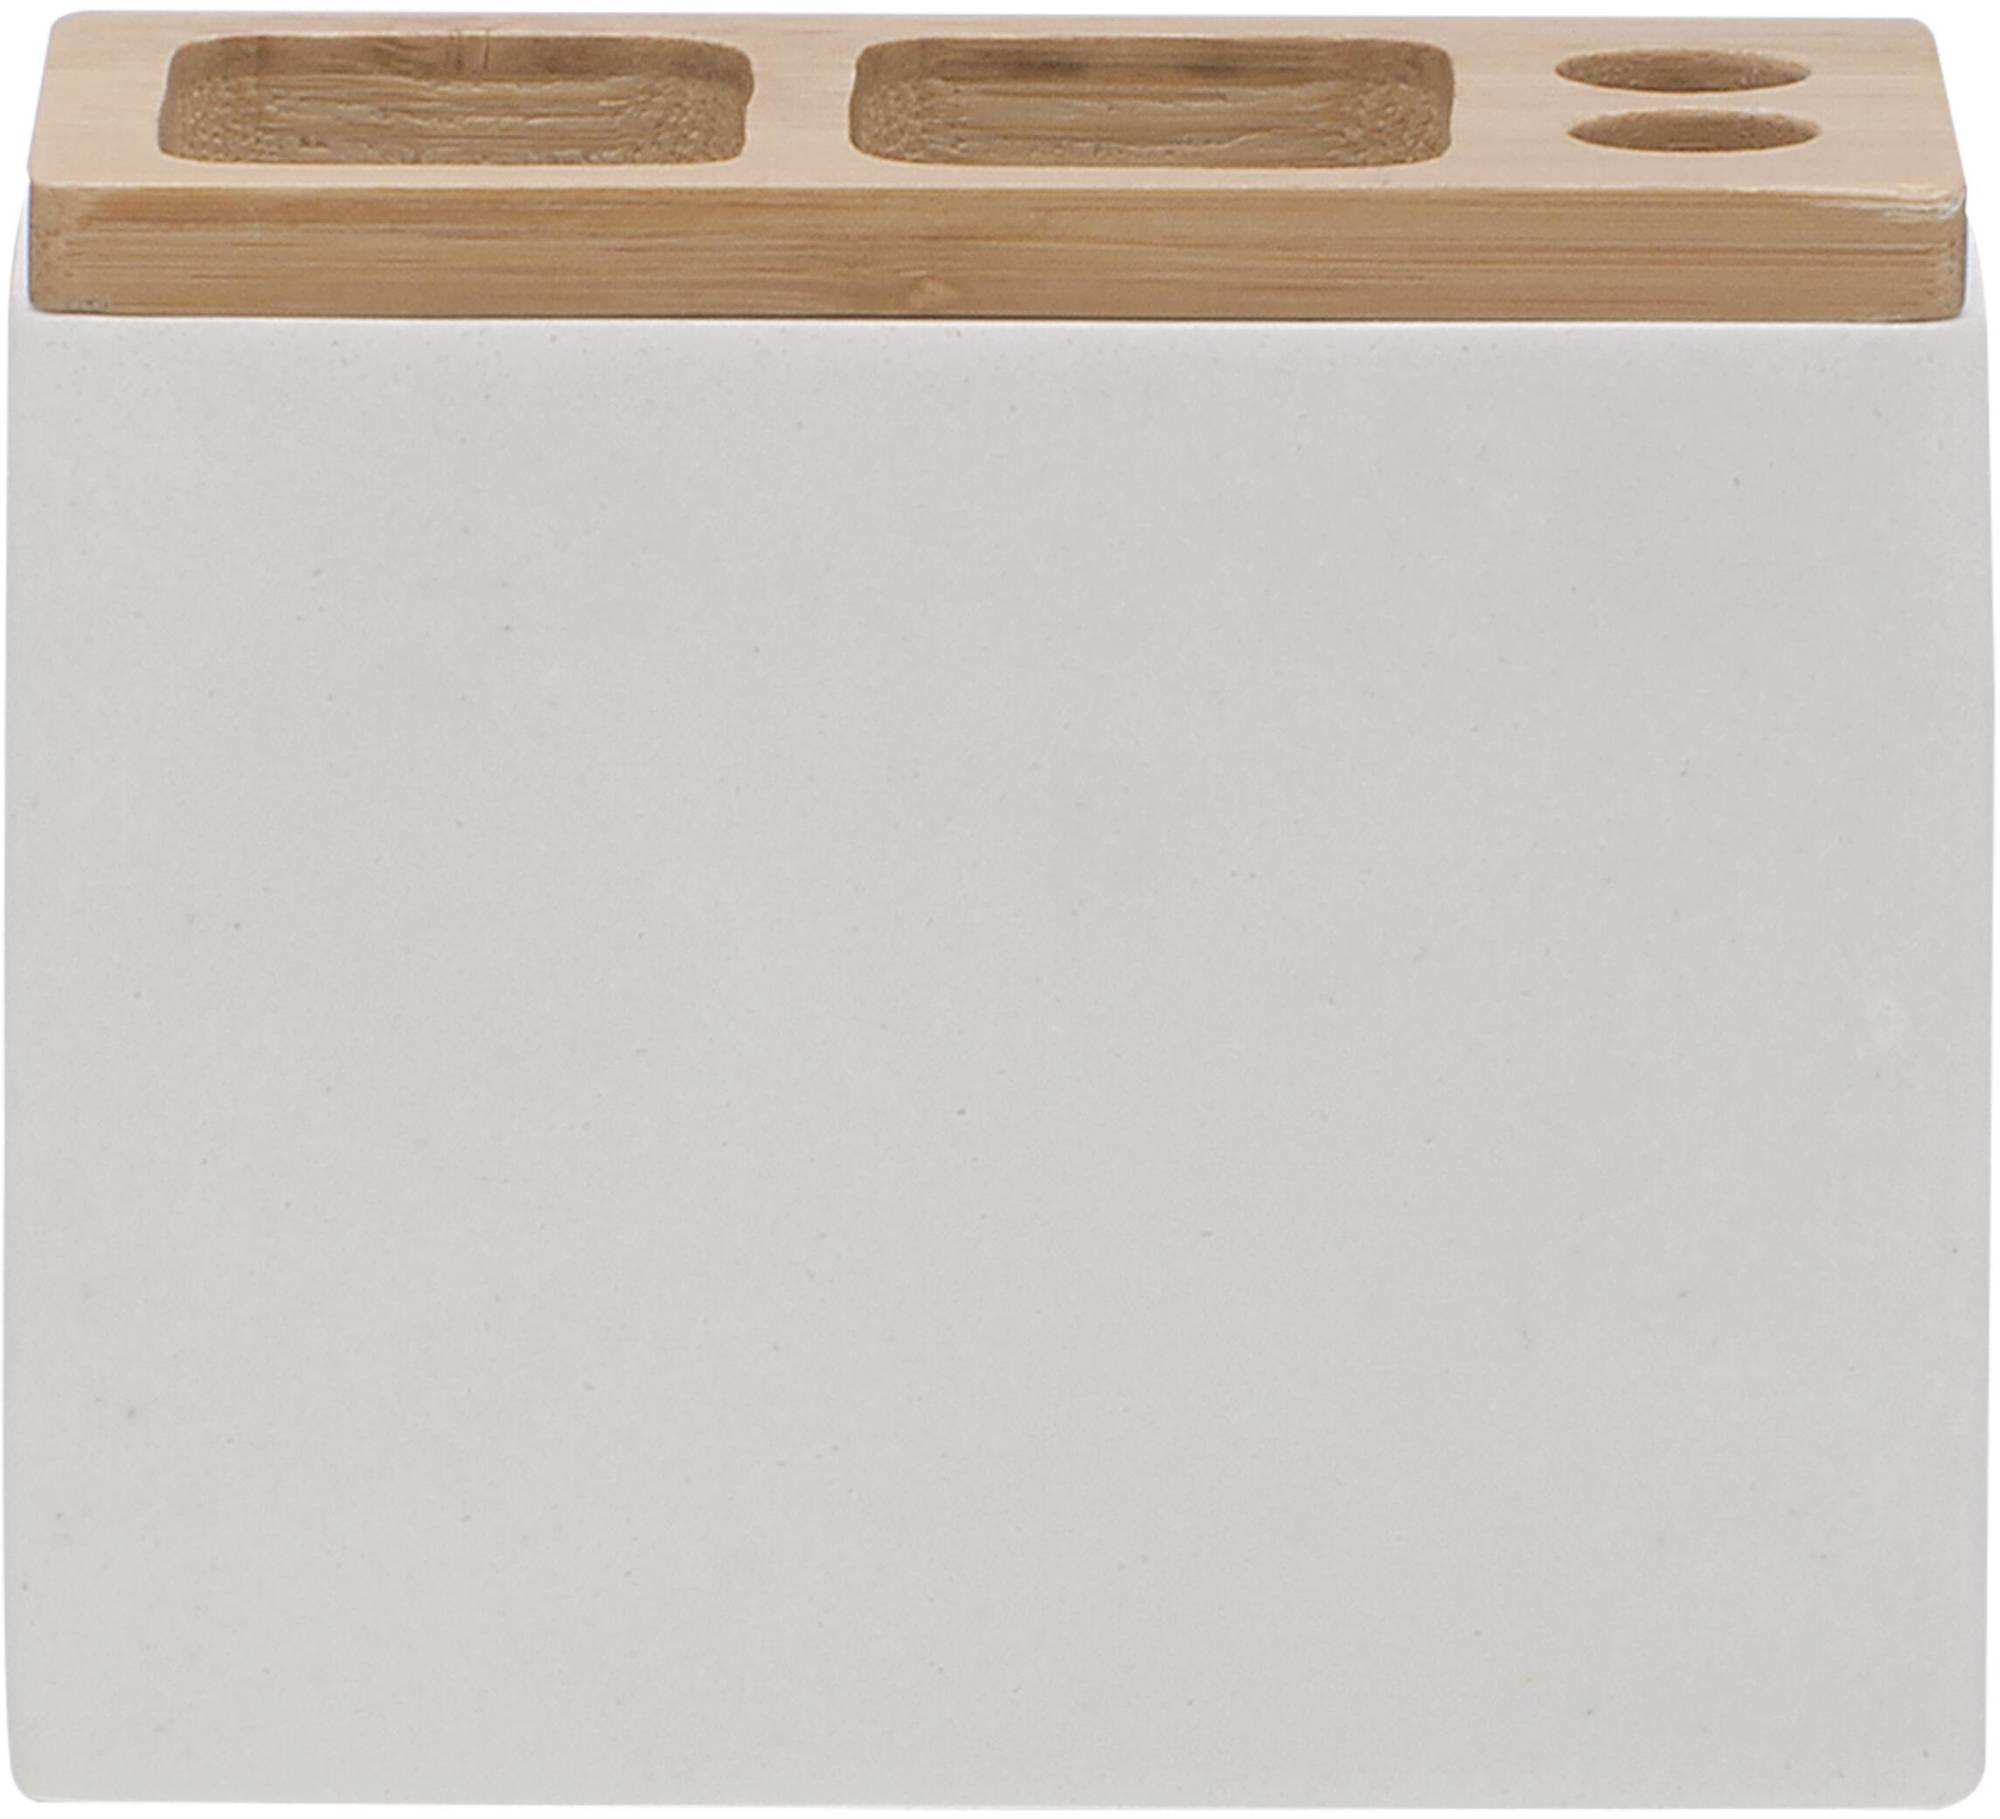 Sealskin GRACE Tandenborstelhouder (tbv electrische tandenborstel) 12x6x10 cm polyresin wit